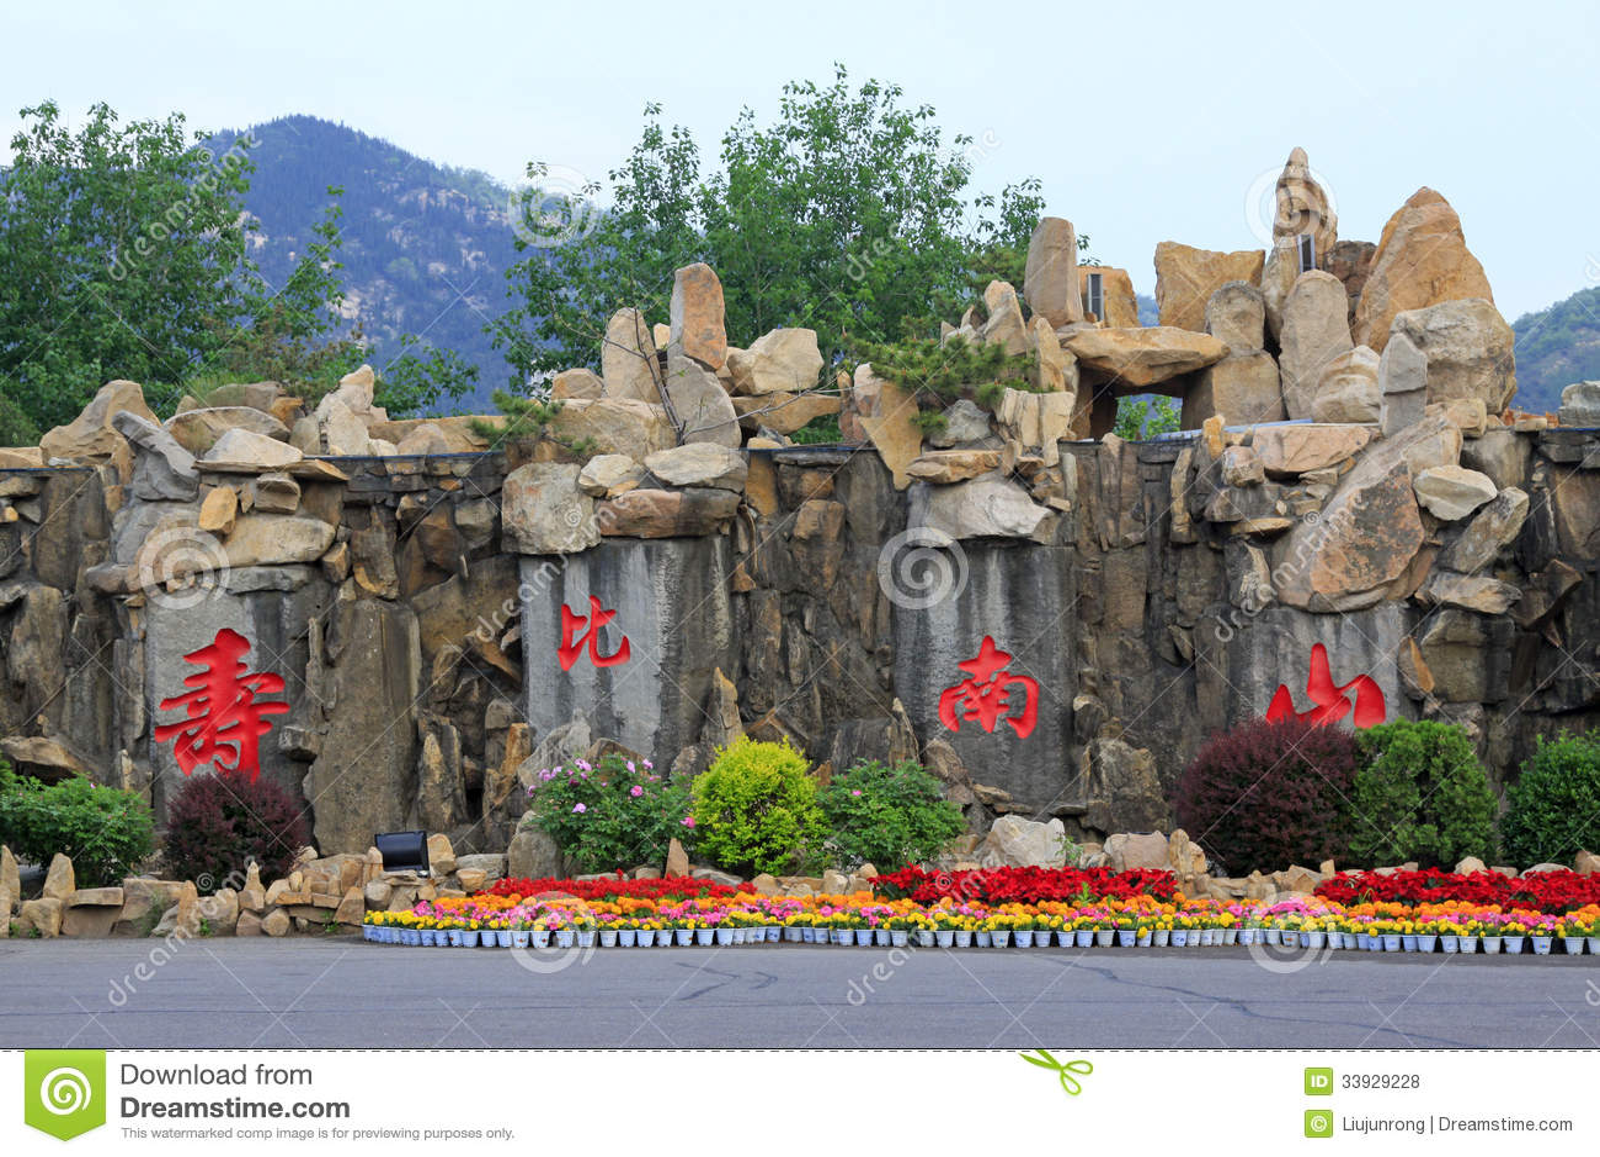 Nanshan Giant Buddha Scenic Area Stone Carving China Longkou May May Longkou Shandong Province